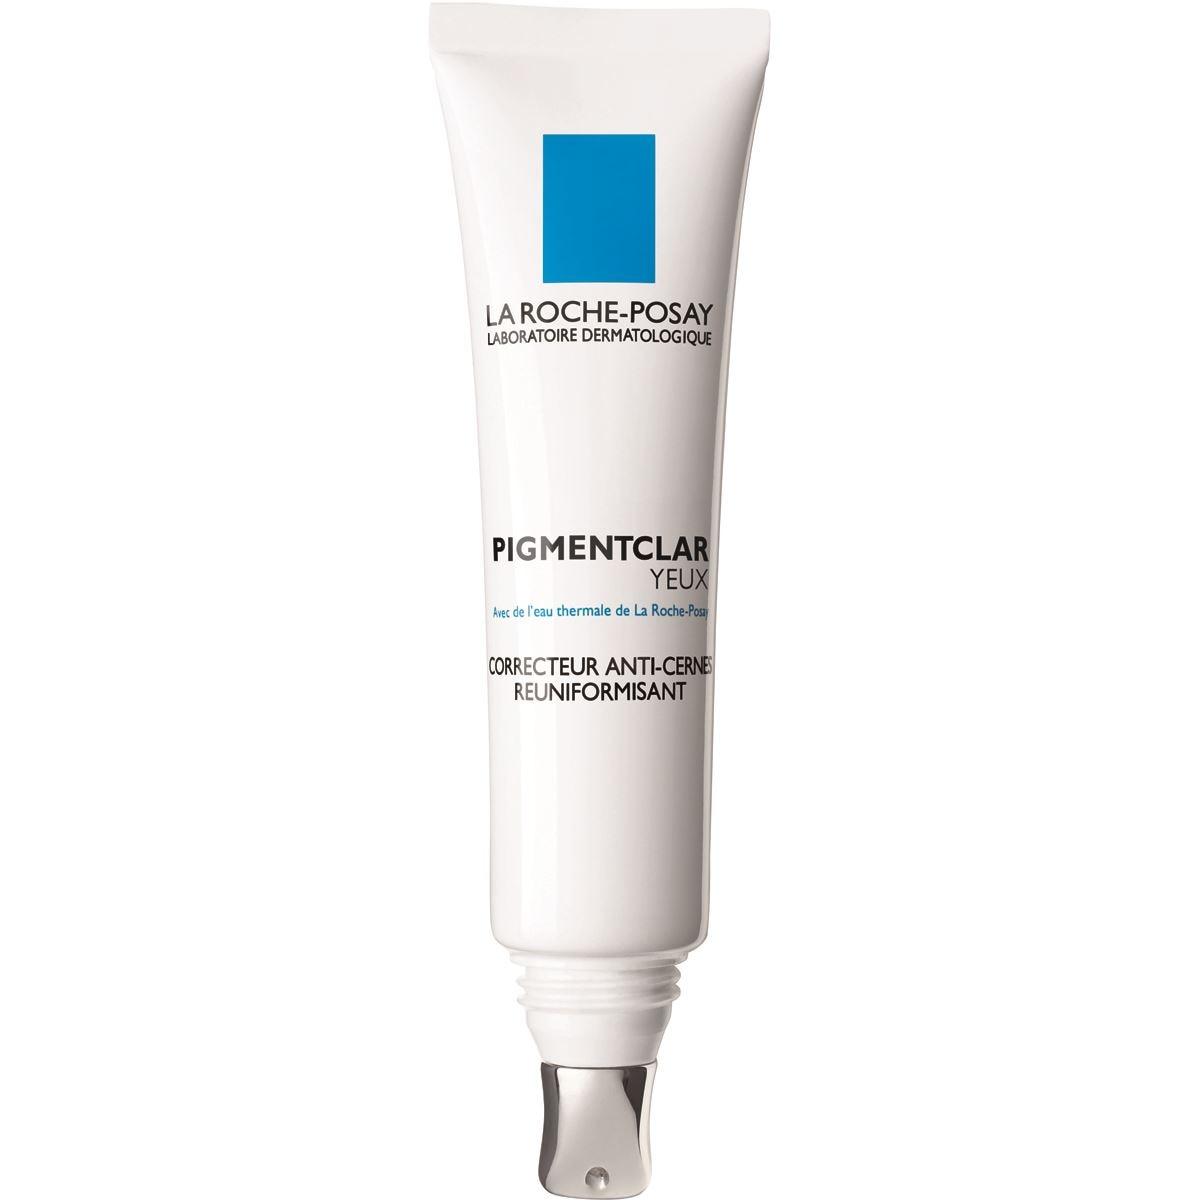 La Roche-Posay Pigmentclar Yeux 15 Ml